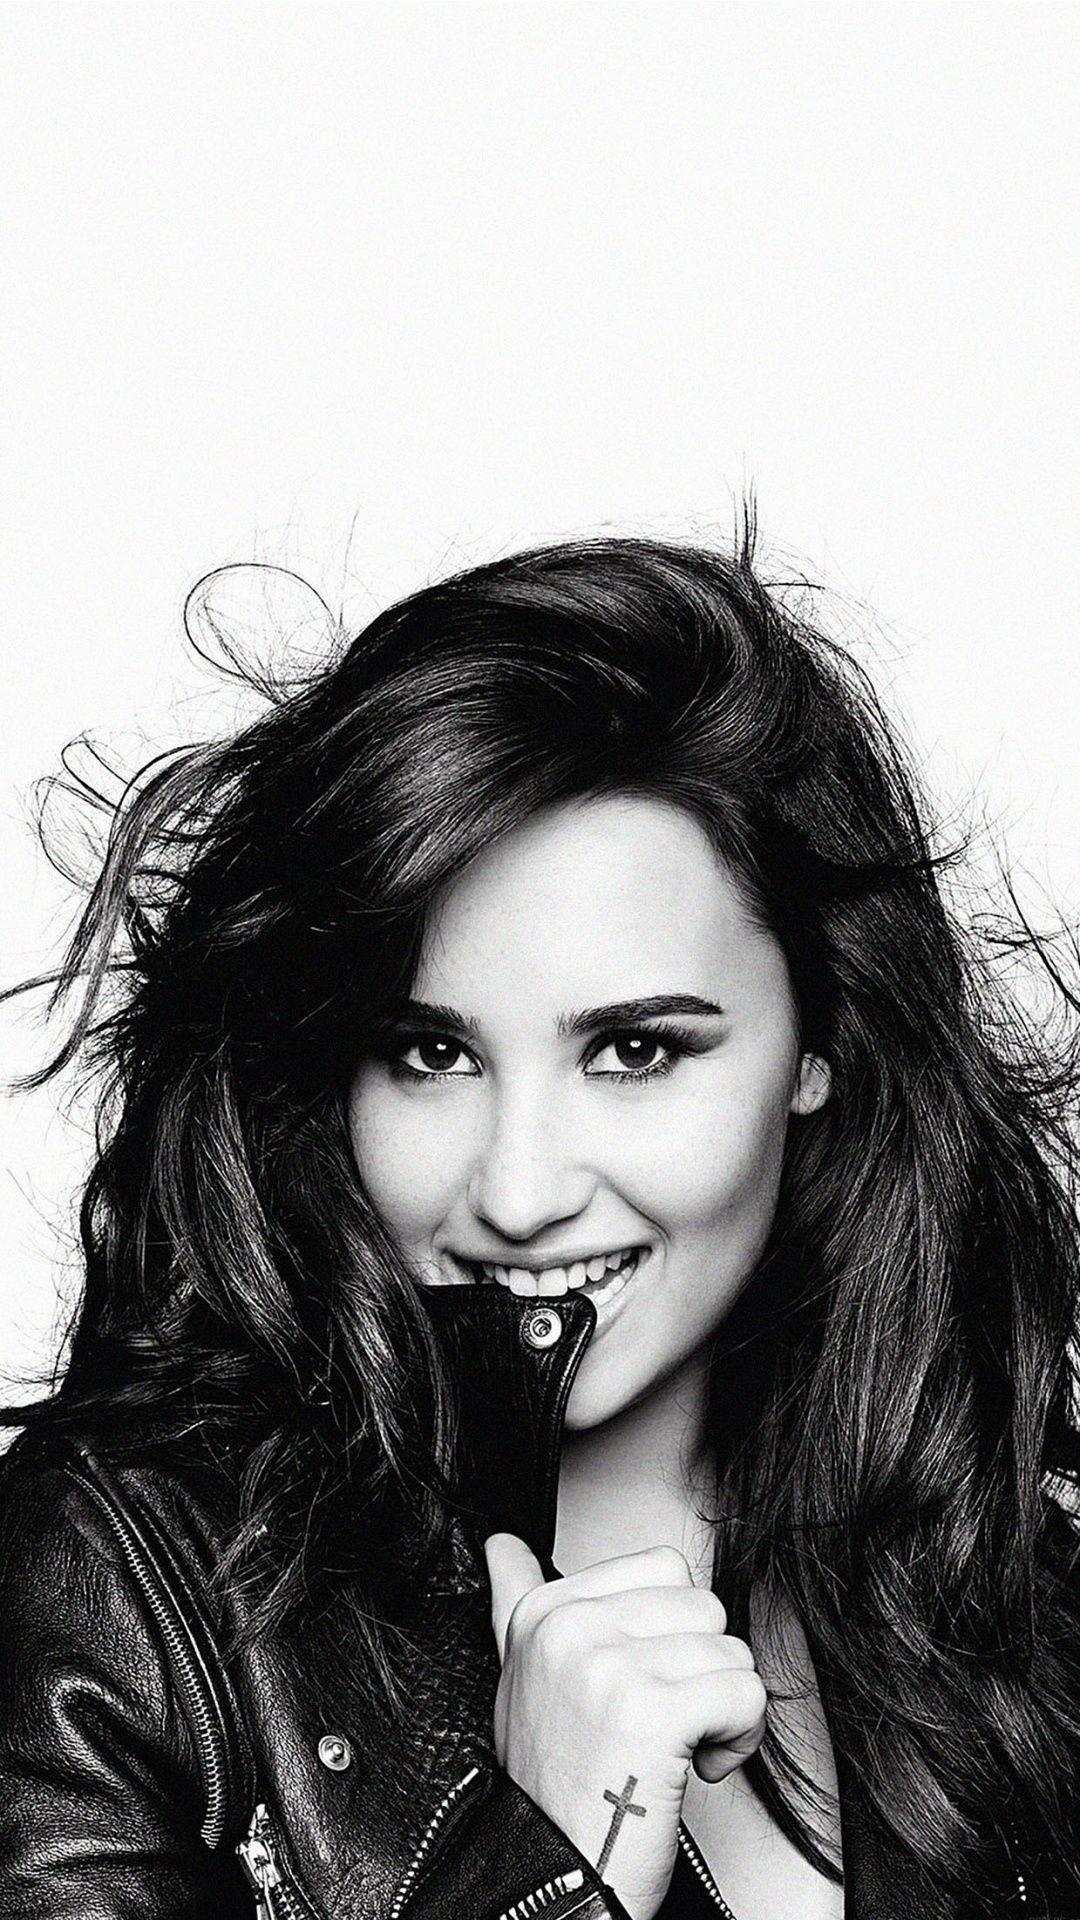 Demi Lovato Black And White Wallpaper For IPhone